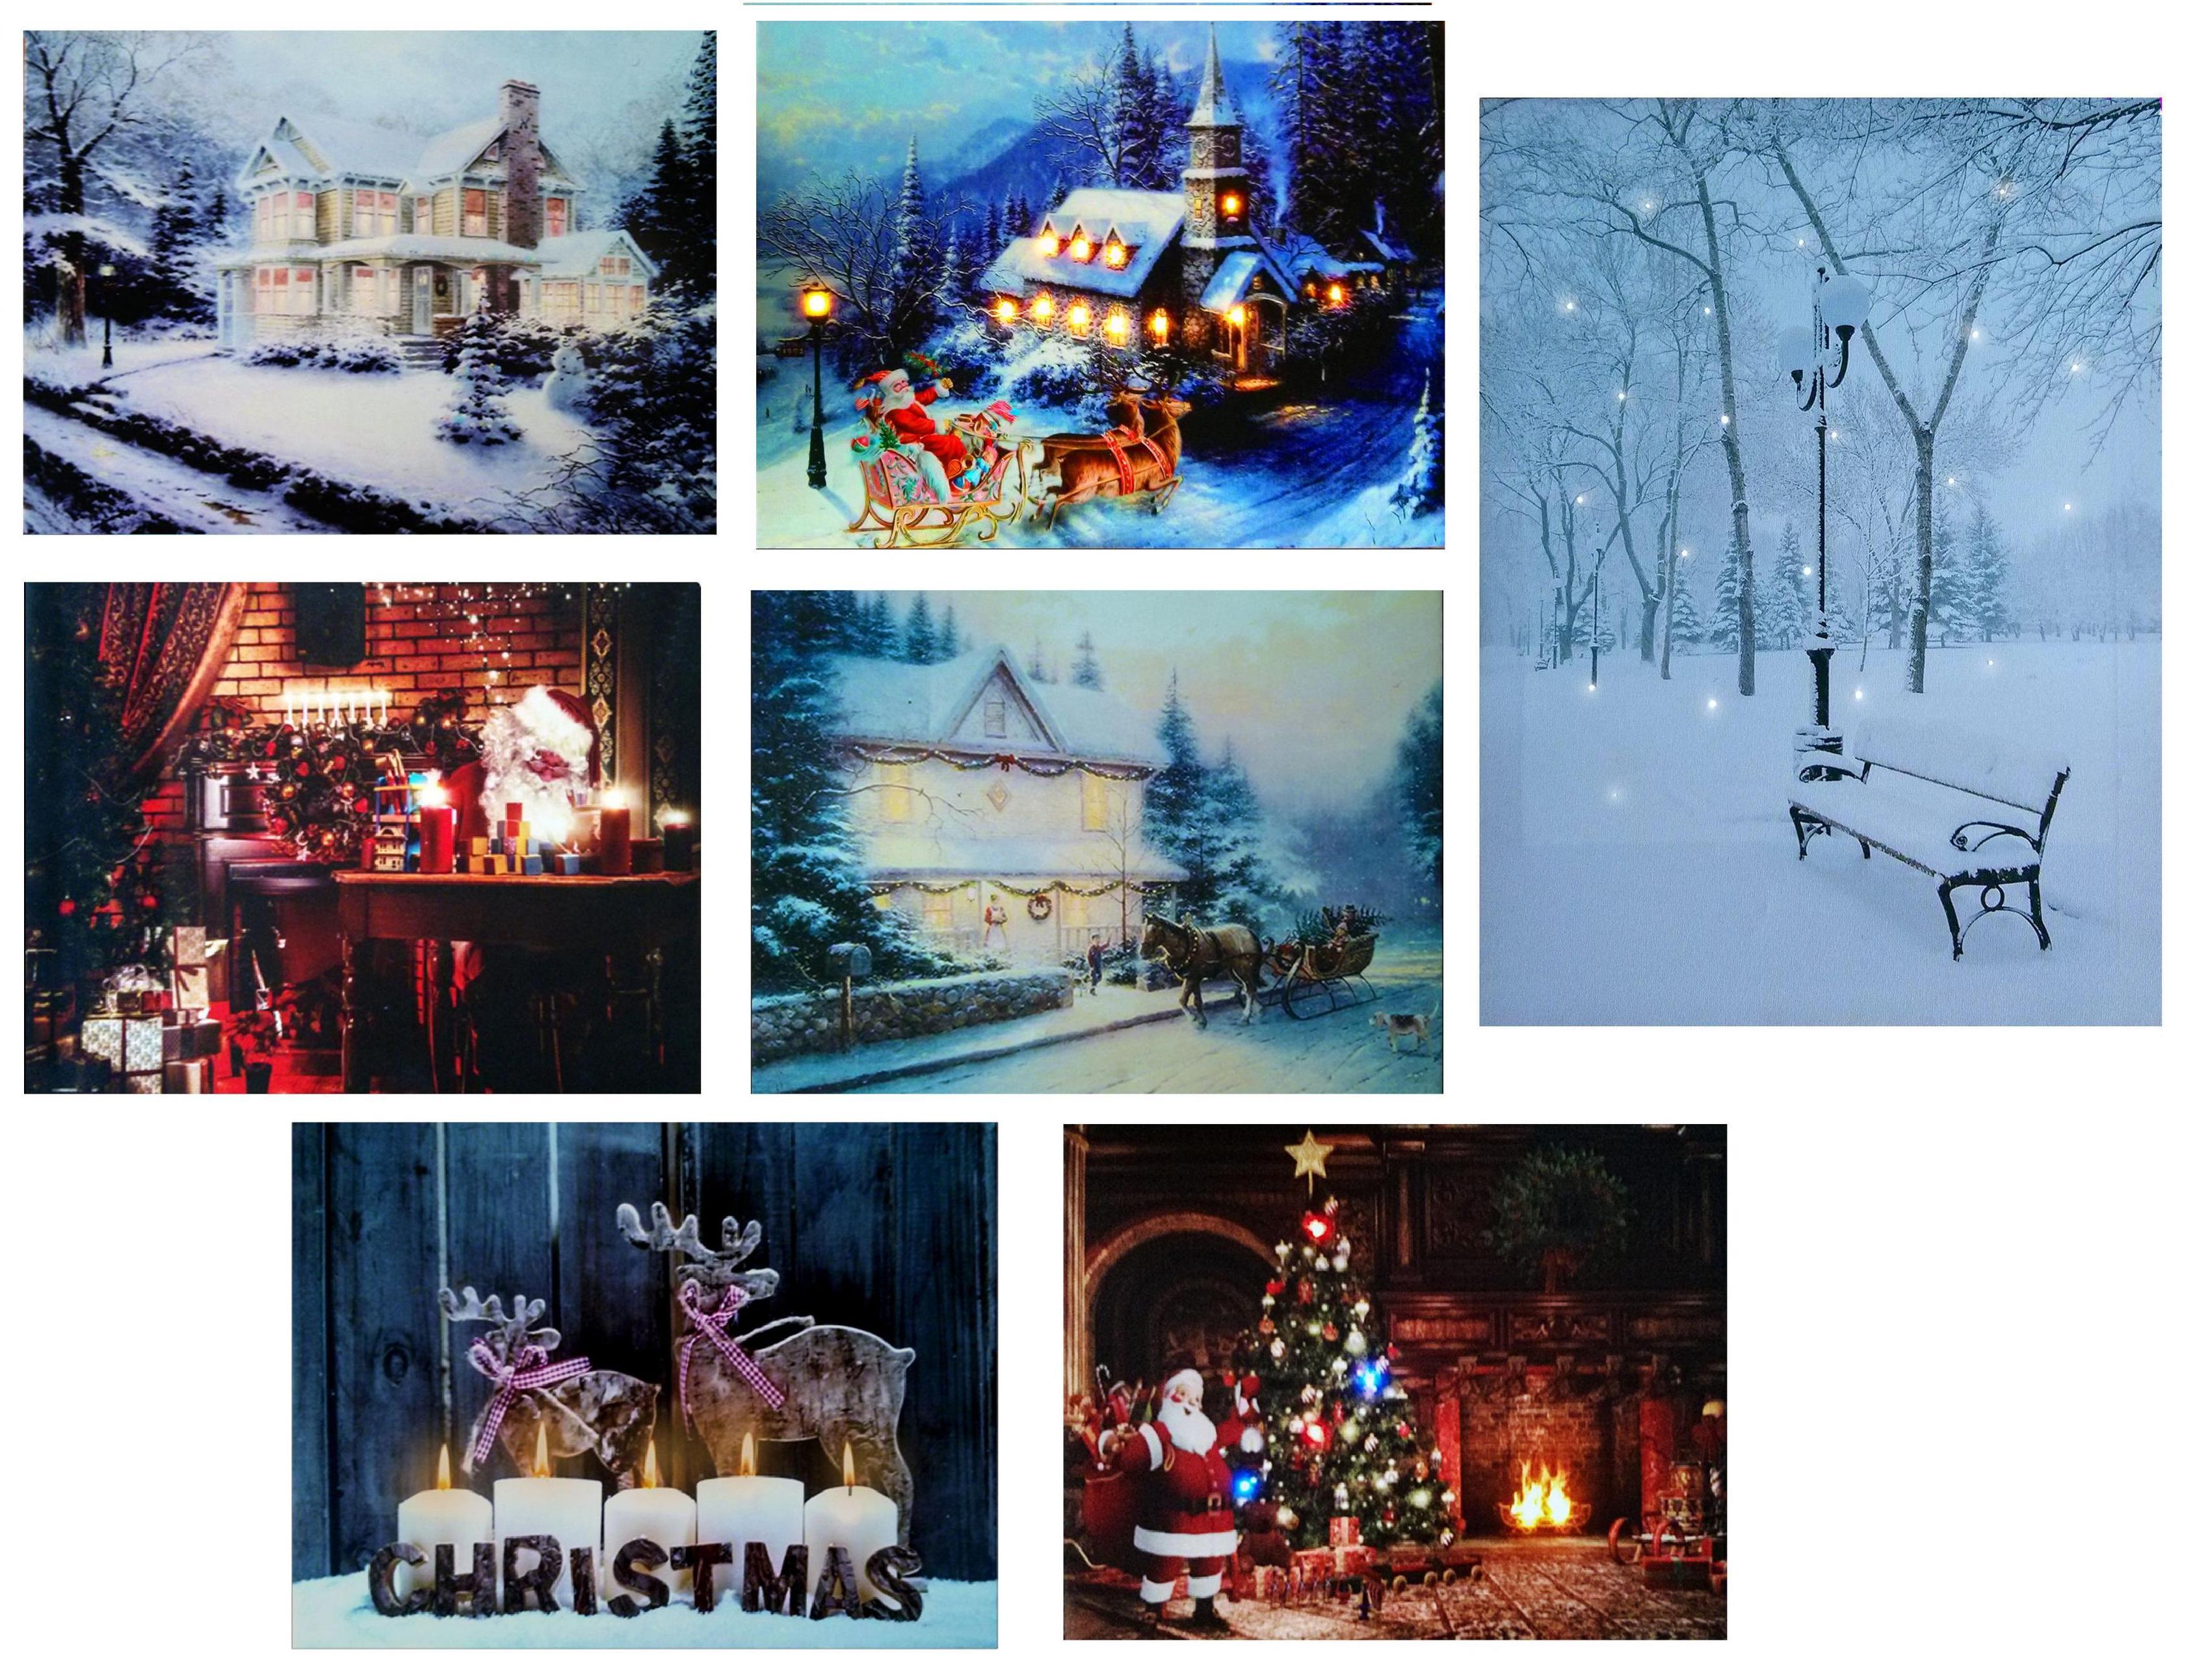 led light up christmas canvas pictures 30cm x 40cm xmas picture. Black Bedroom Furniture Sets. Home Design Ideas